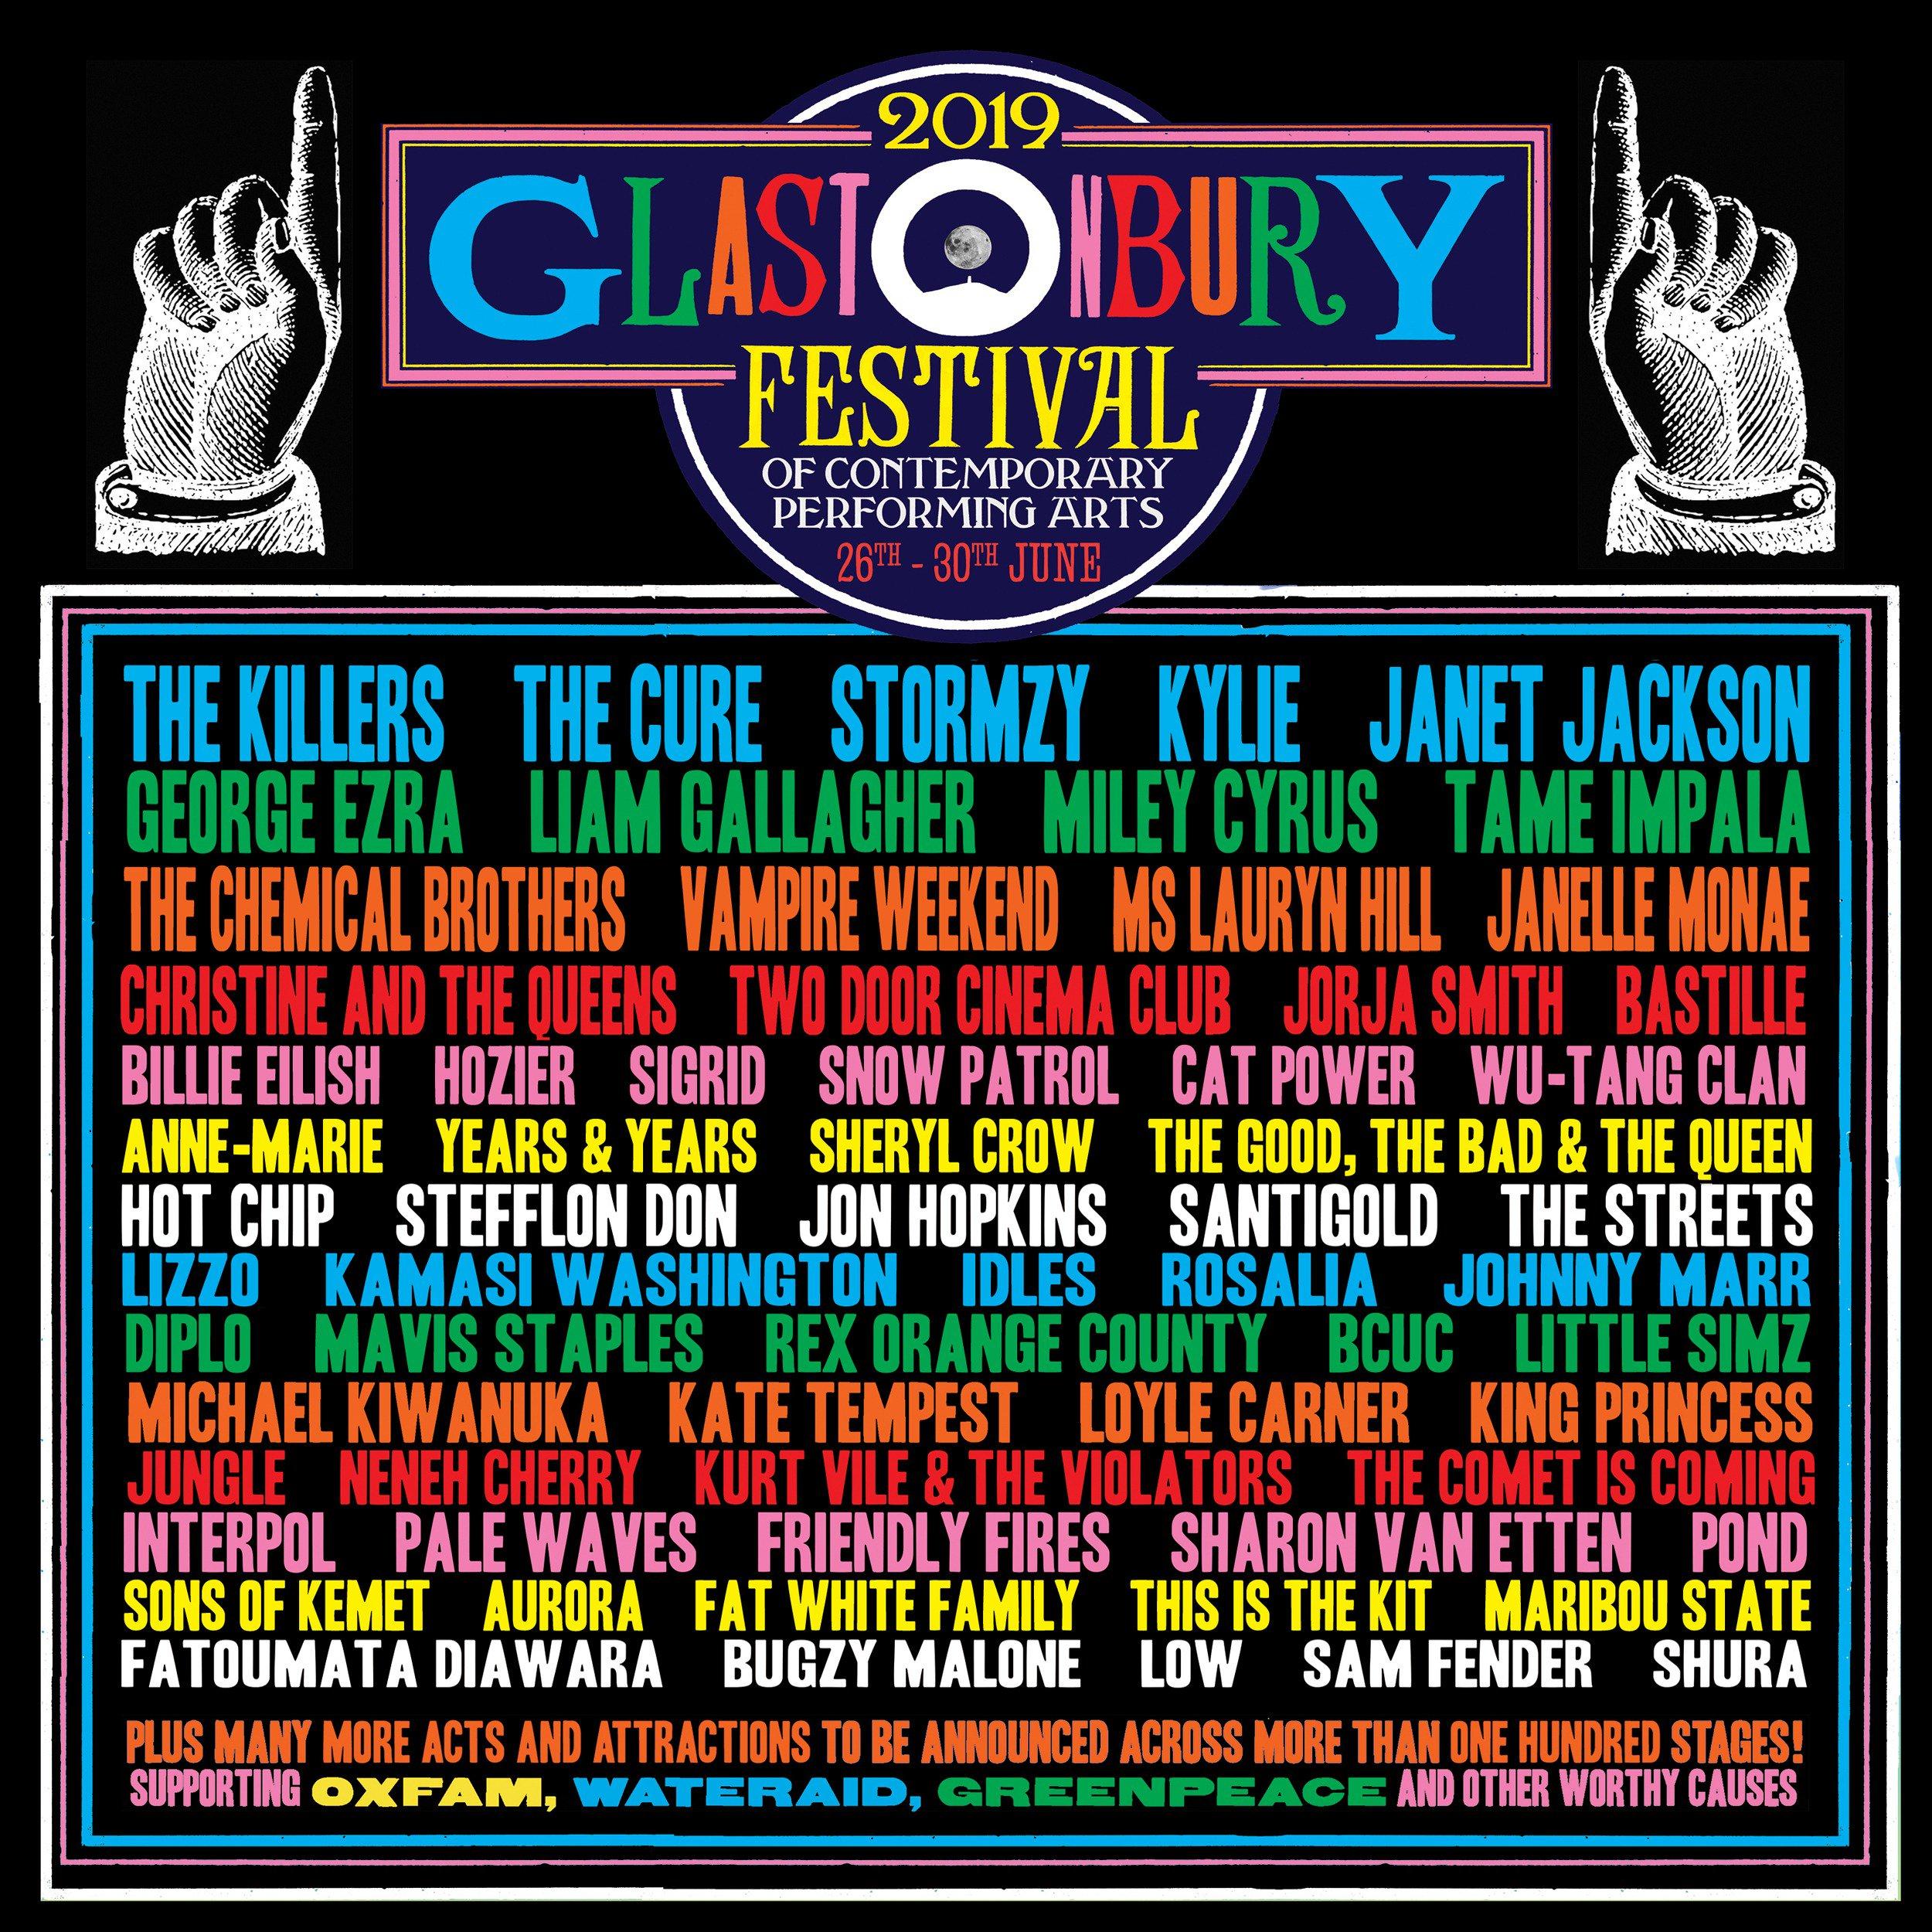 Mad Cool Festival 2019. The Cure, Iggy Pop, The National, Bon Iver, Smashing Pumpkins, Robyn, Sharon Van Etten... ¡Y lo que queda! #SoundsBetterLive - Página 7 D1rzgebXgAAXDIY?format=jpg&name=4096x4096